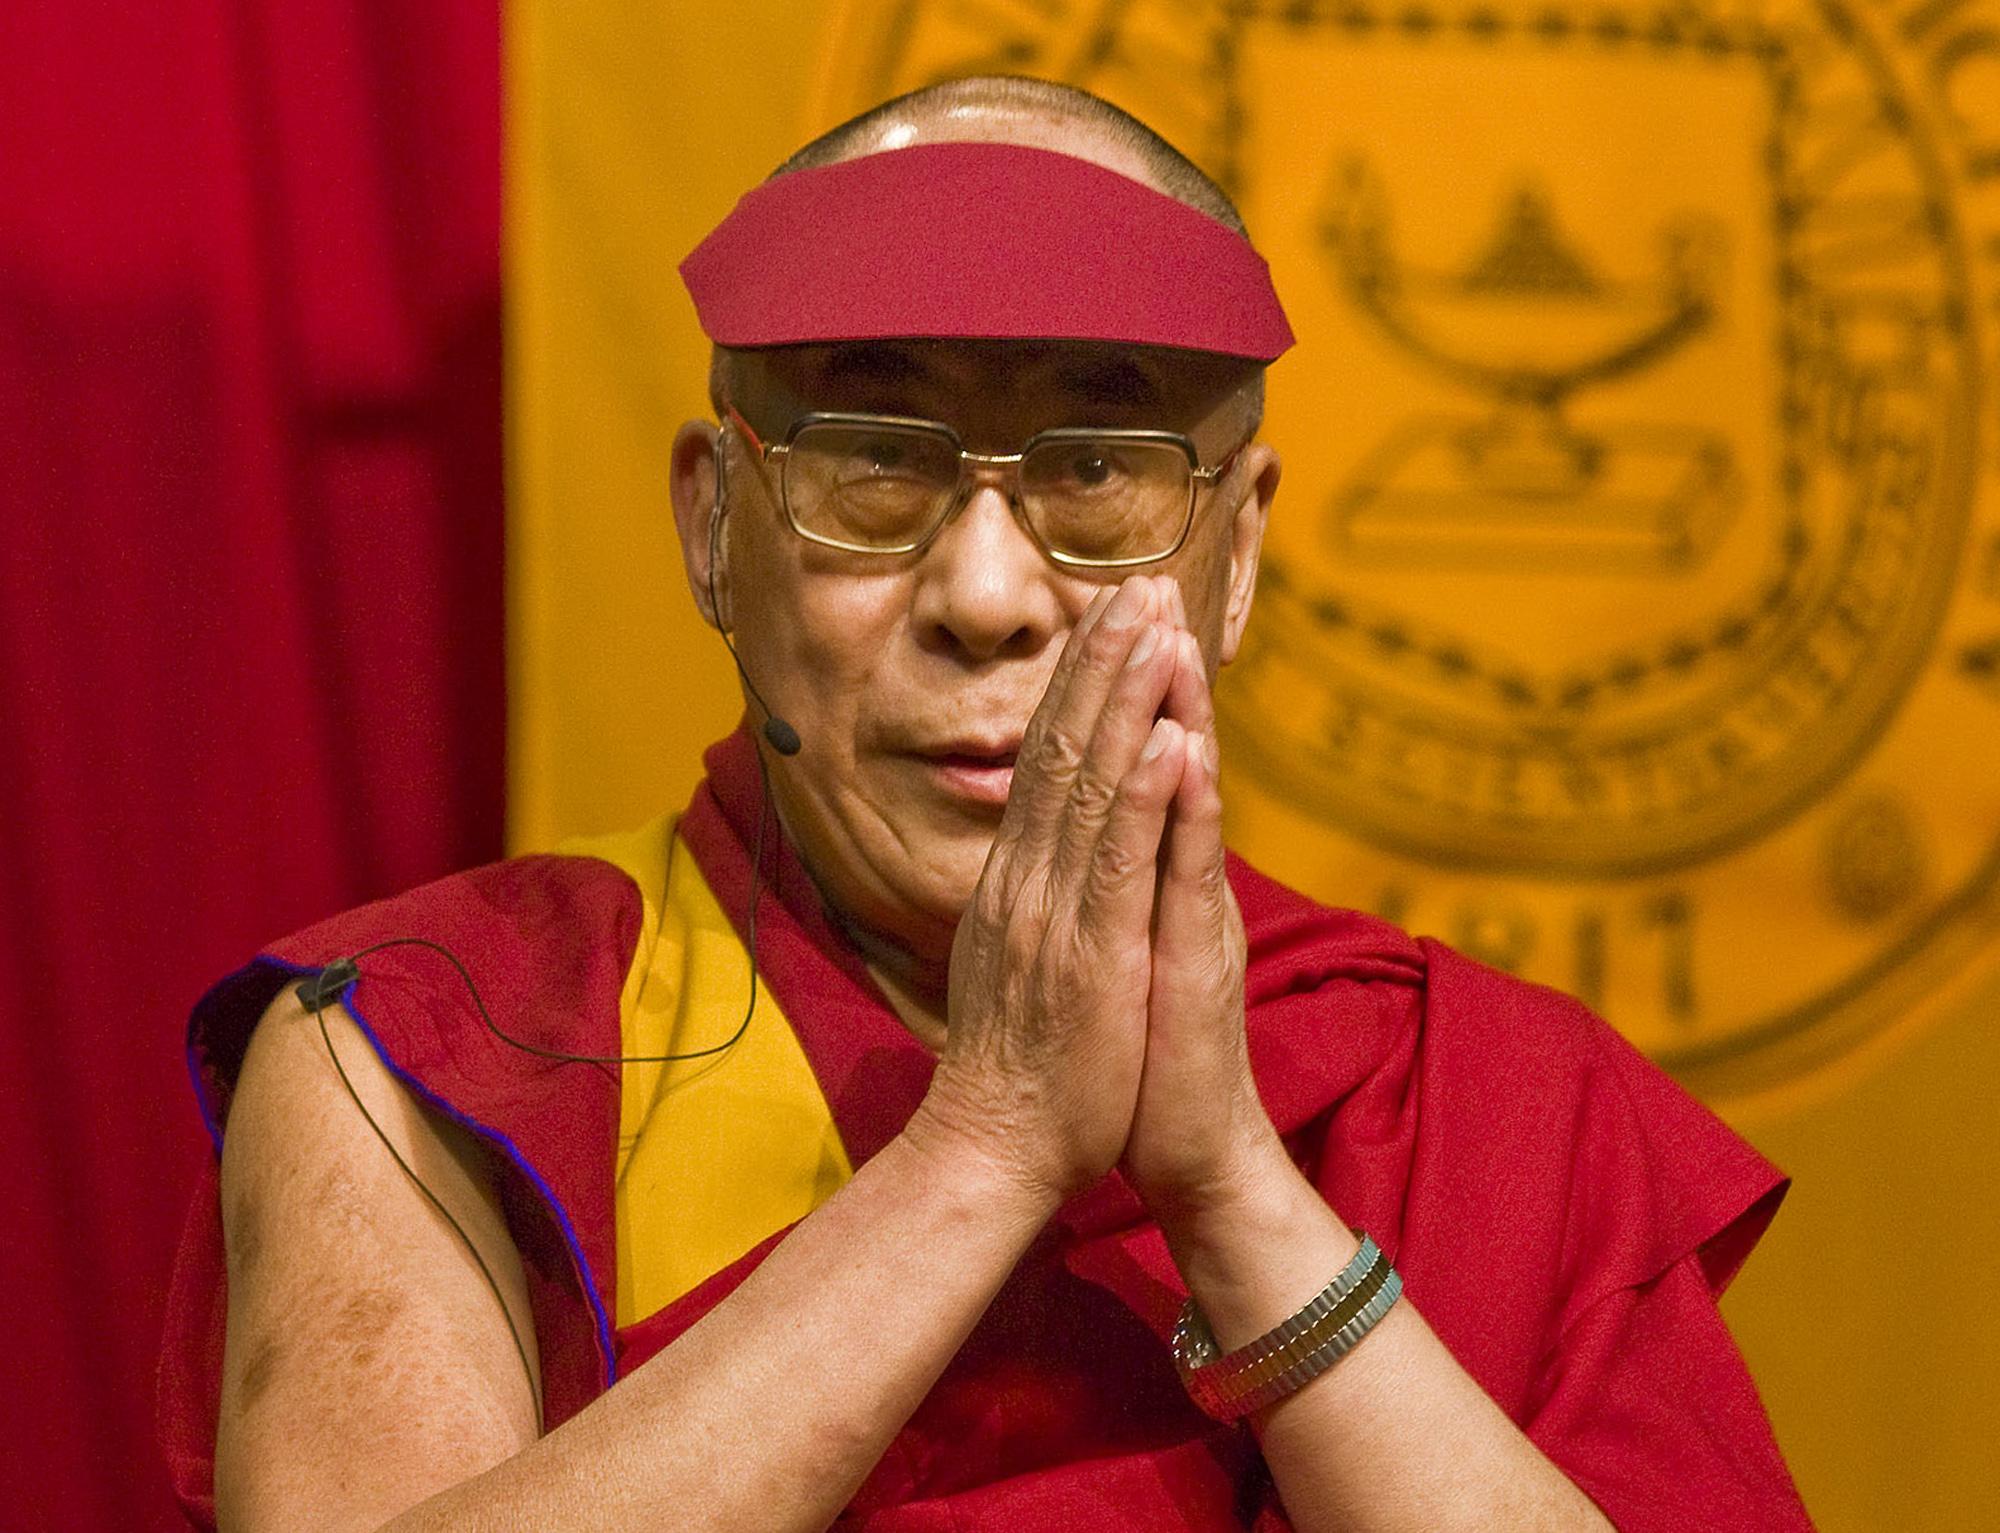 Der Dalai Lama über Falun Gong und die Verfolgung in China